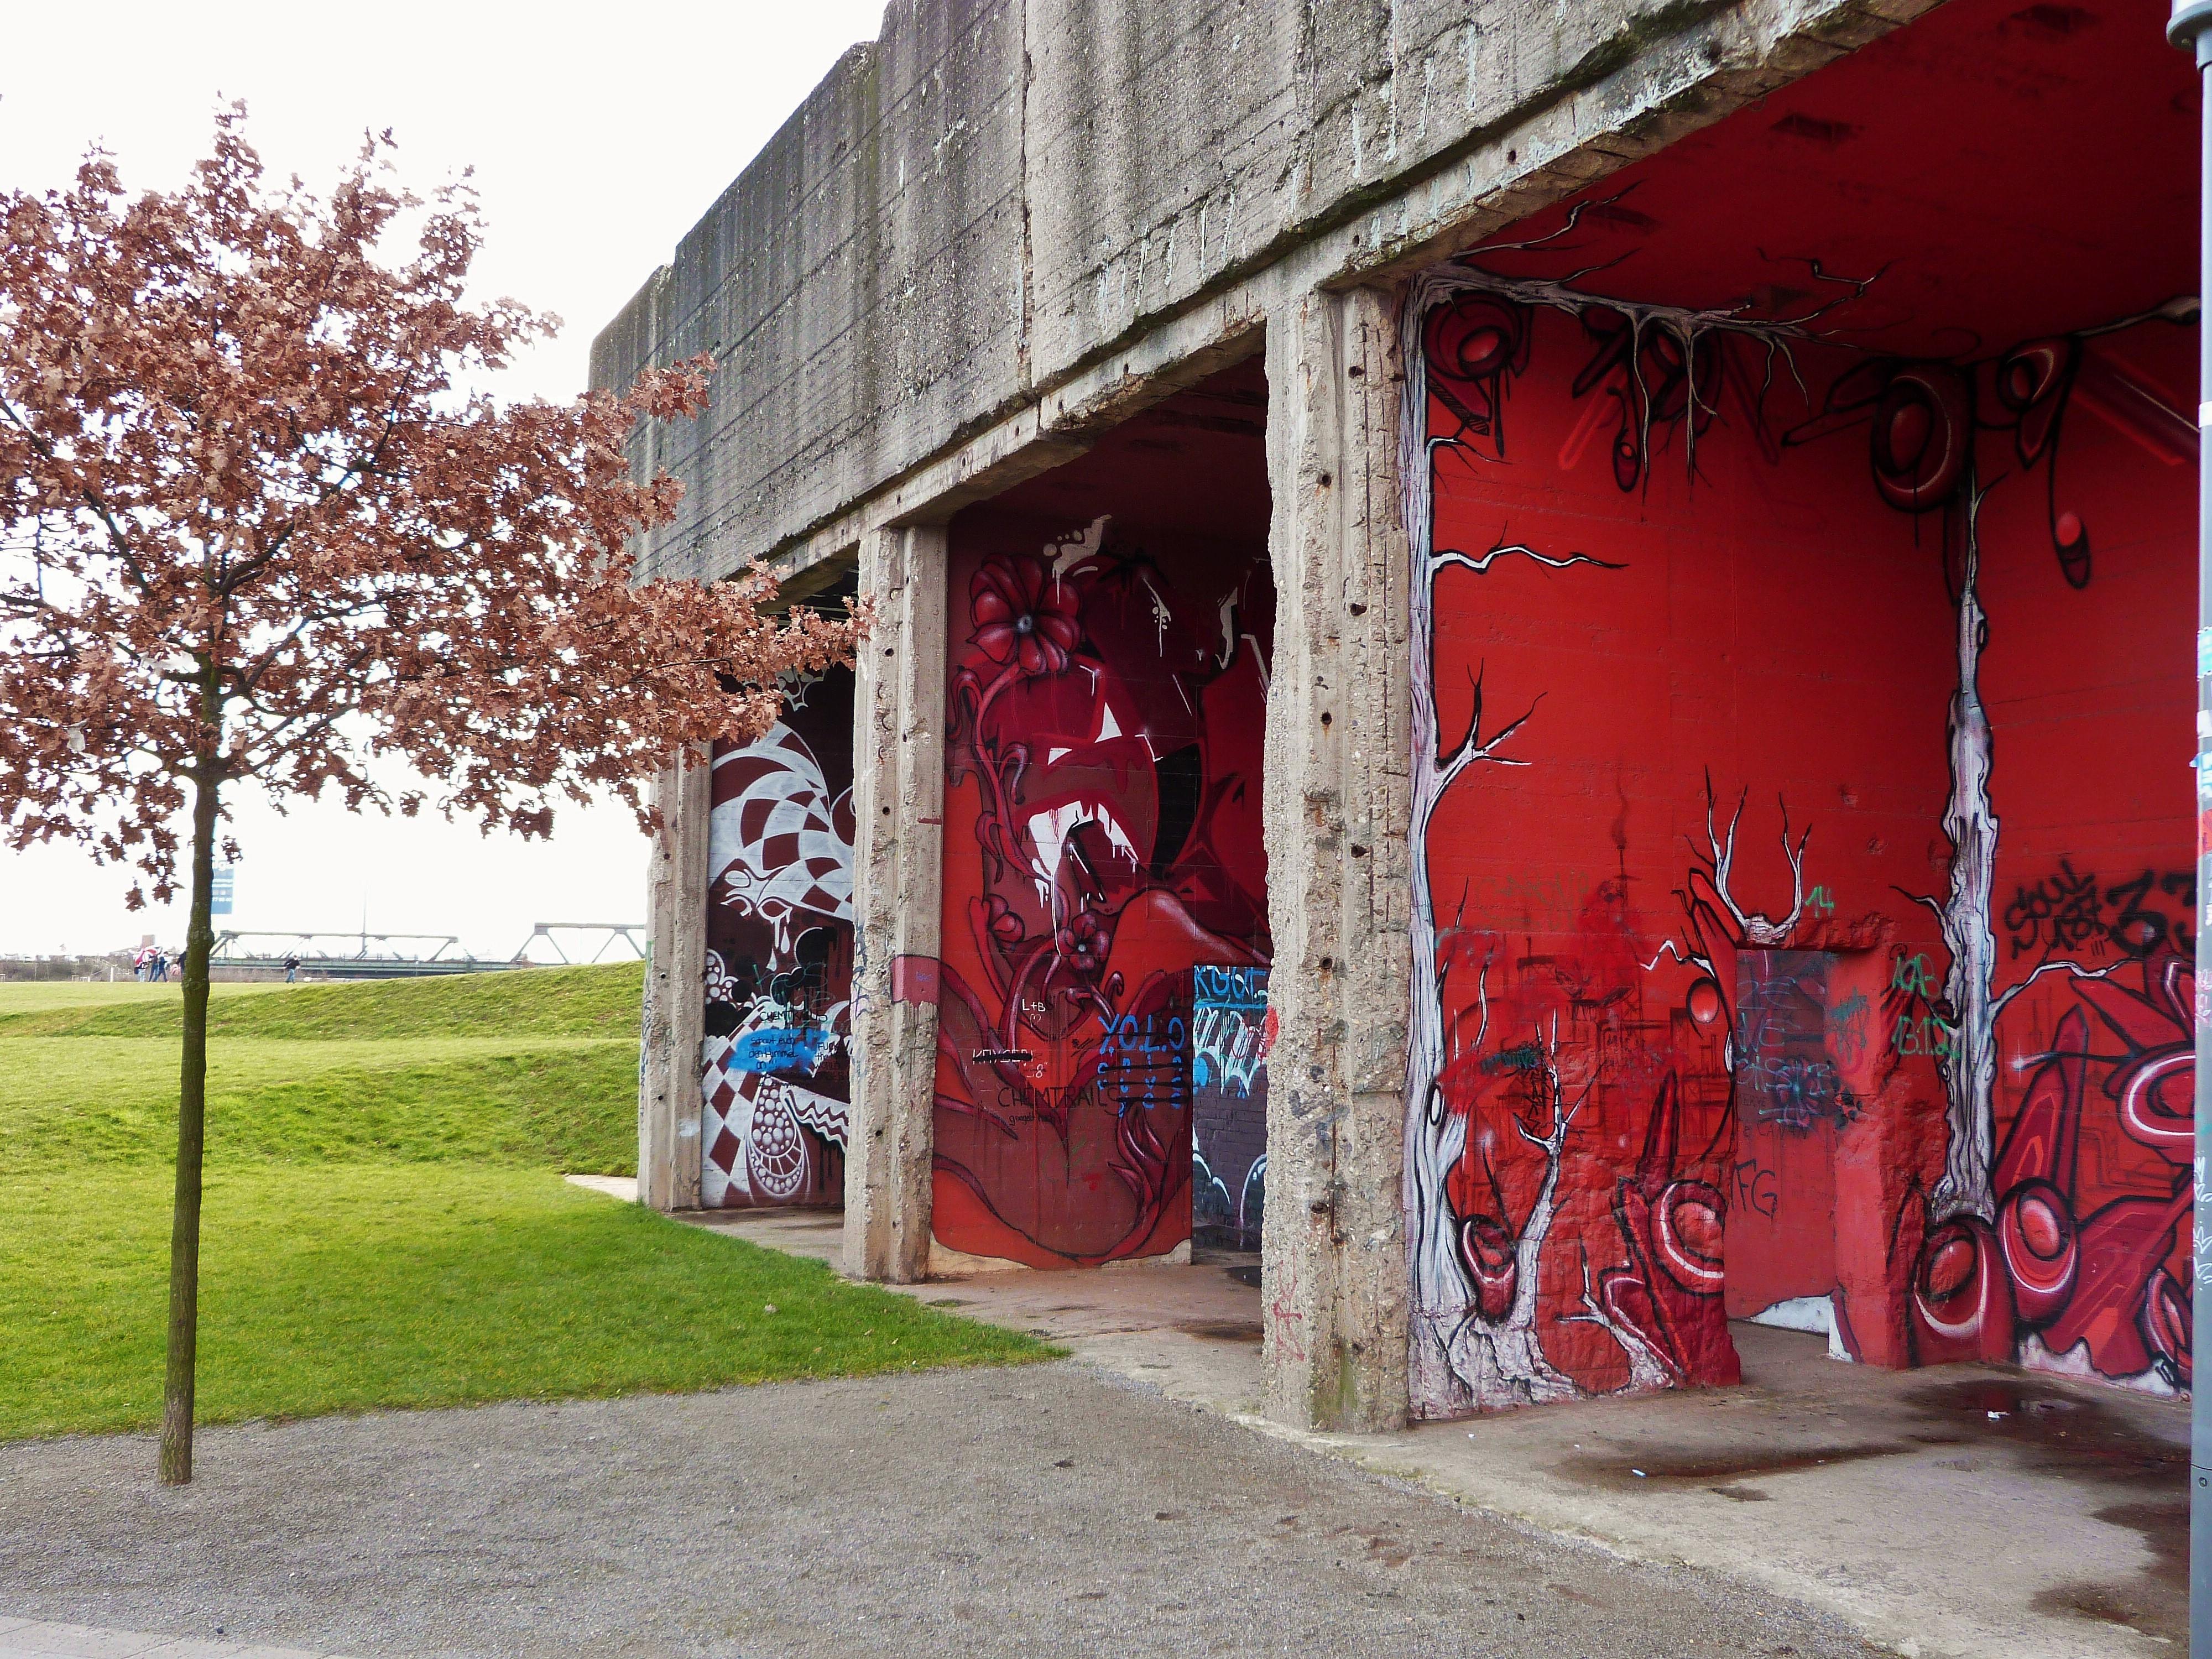 Graffiti Duisburg rheinpark graffiti duisburg 2 continental breakfast travel